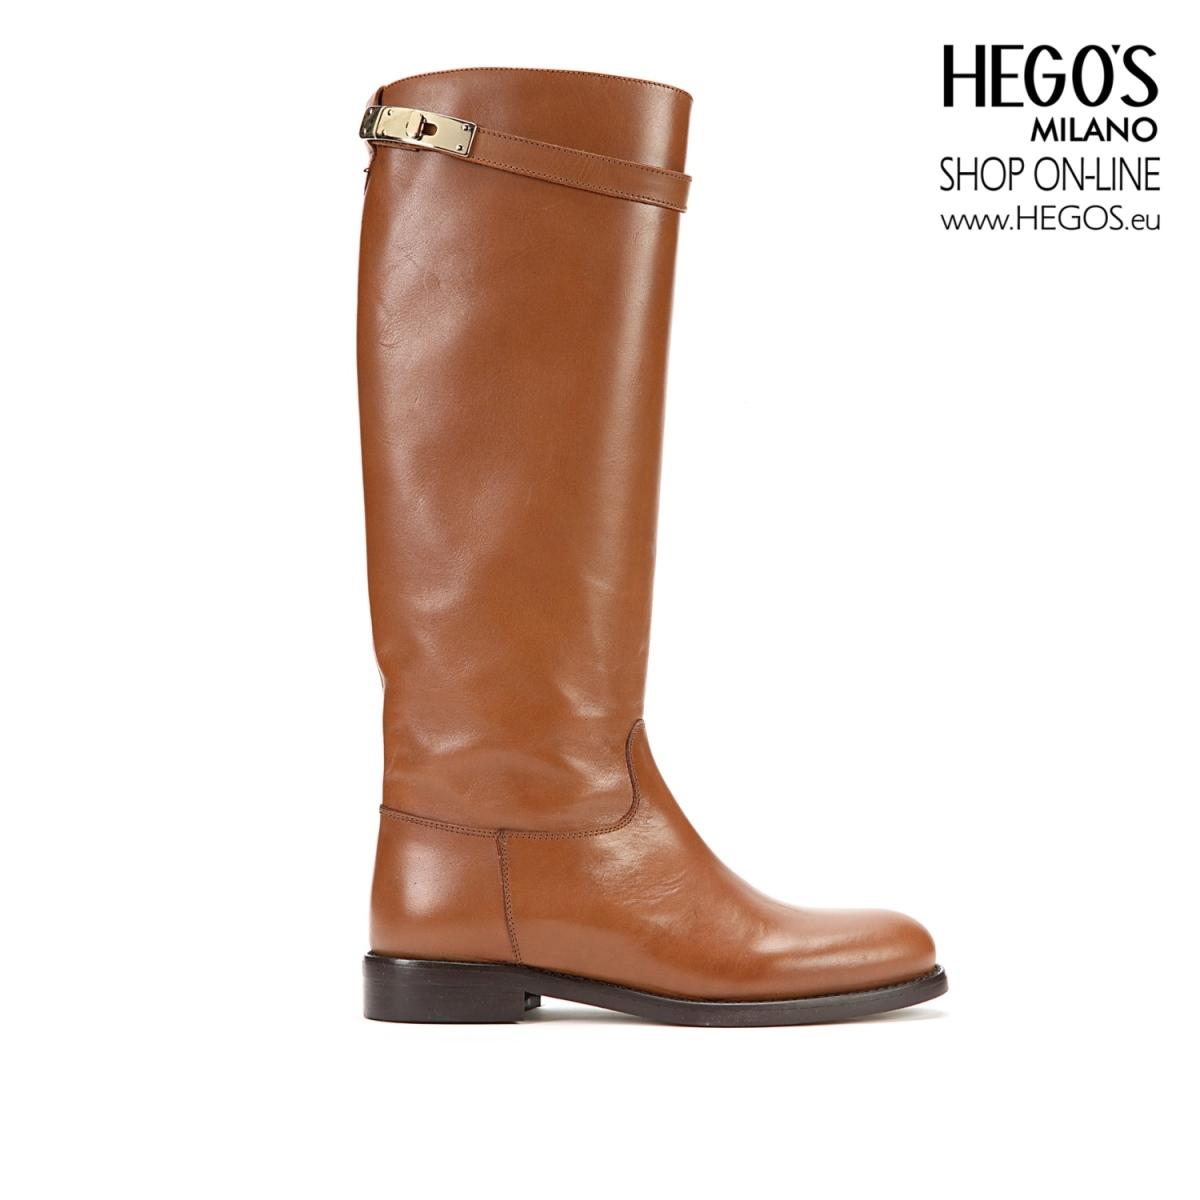 22825_HEGOS_MILANO_699